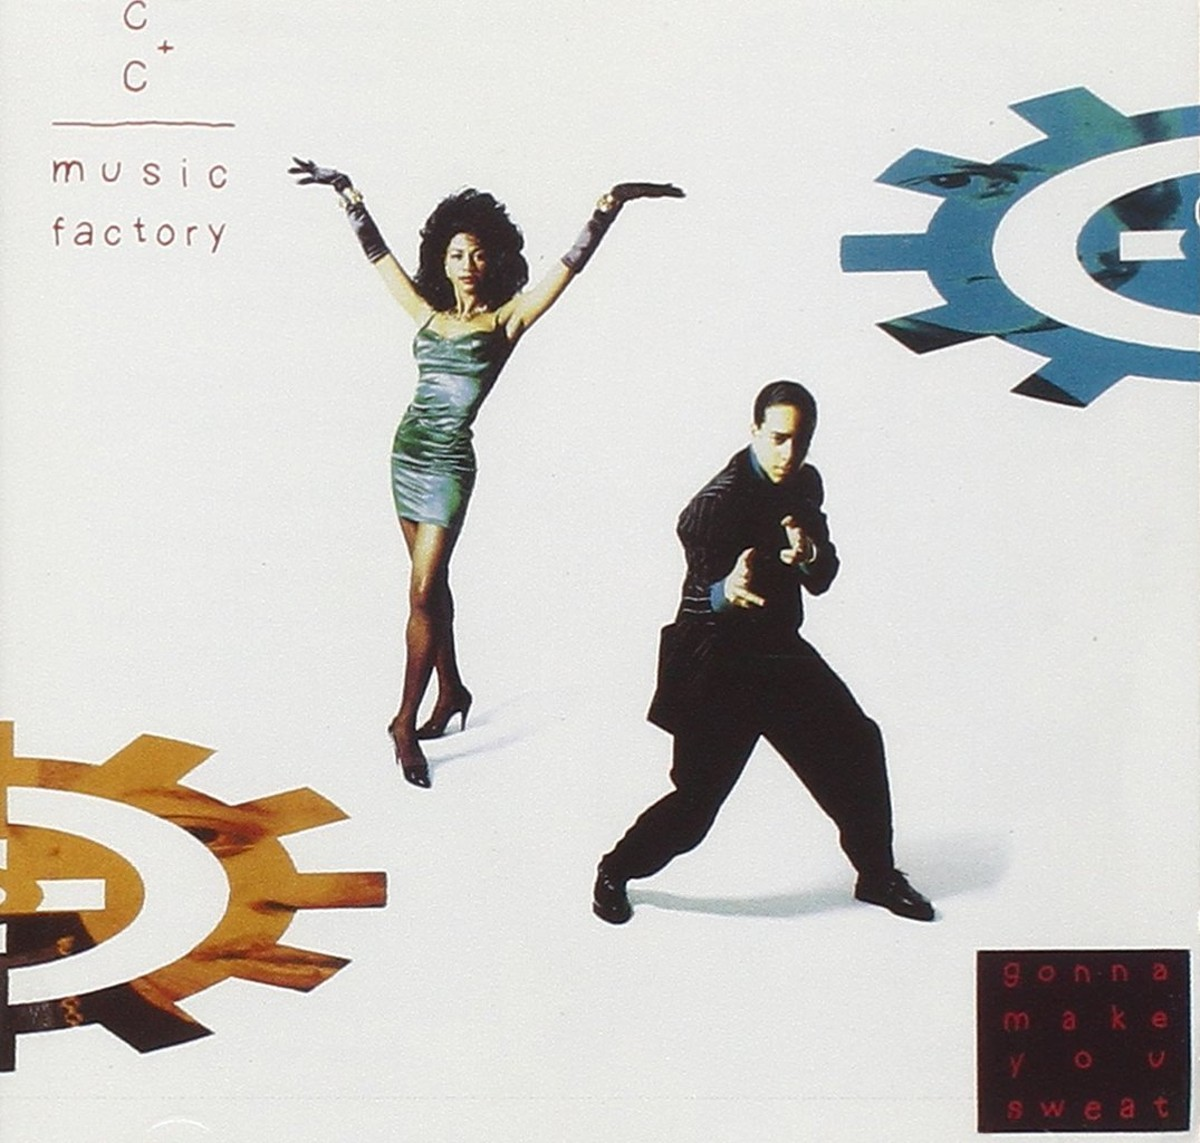 cc_music_factory.jpg